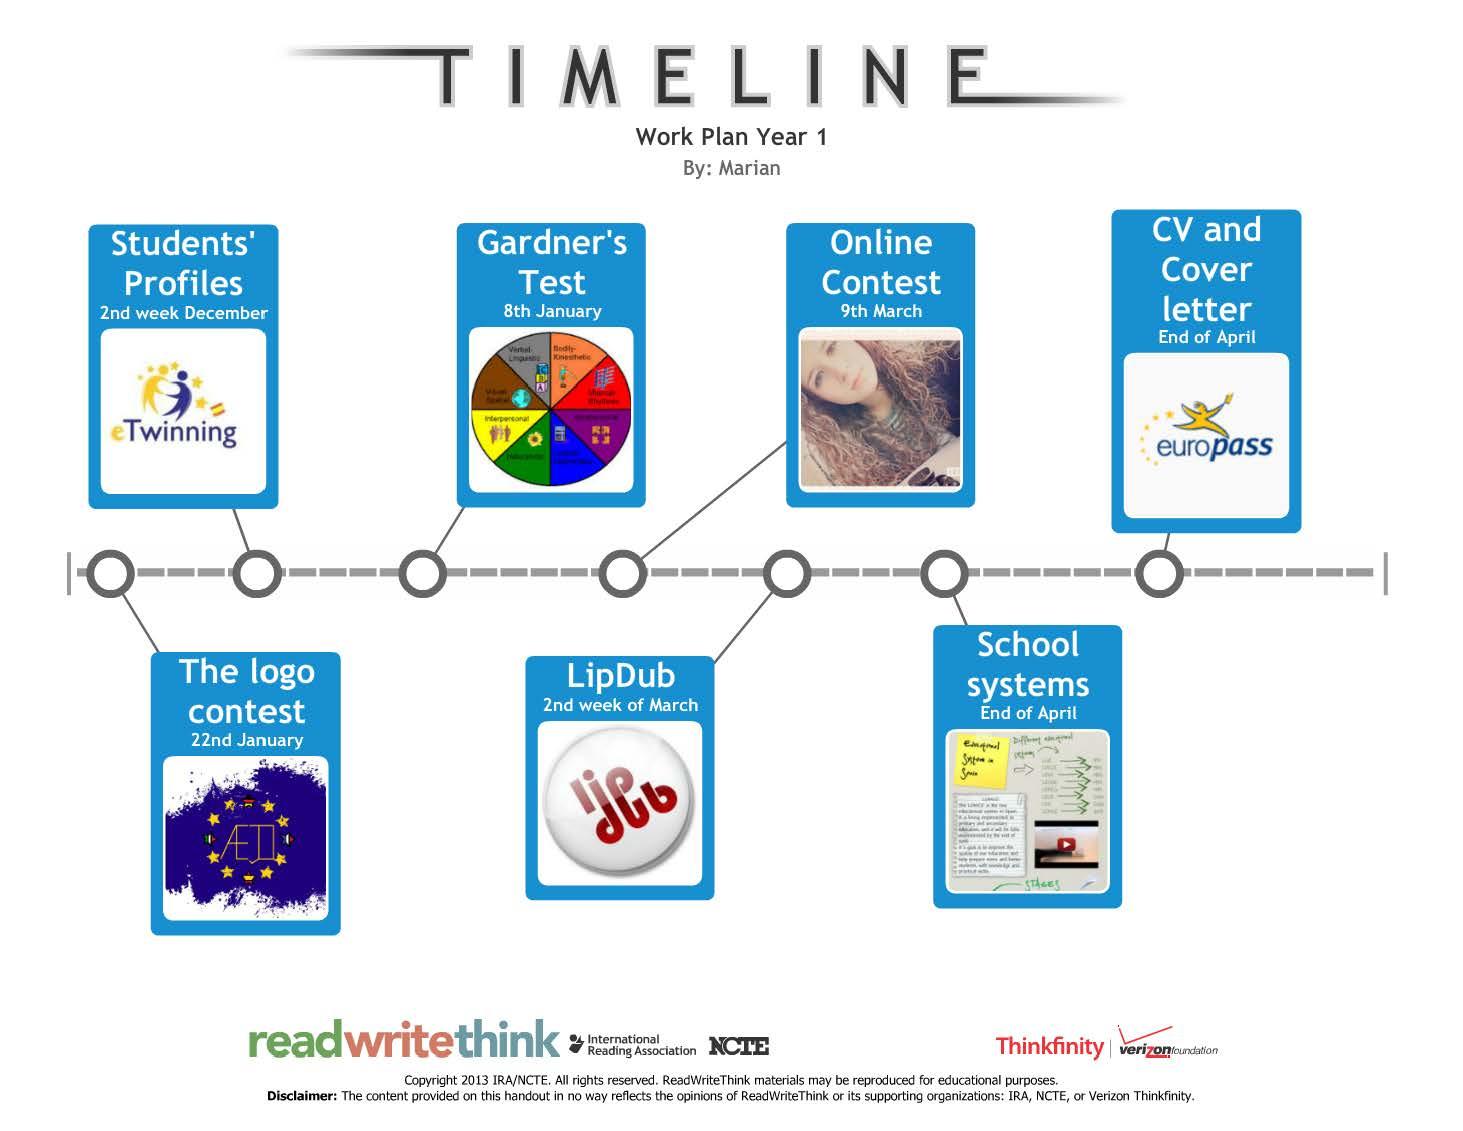 cronograma primer año timeline_Página_1.jpg